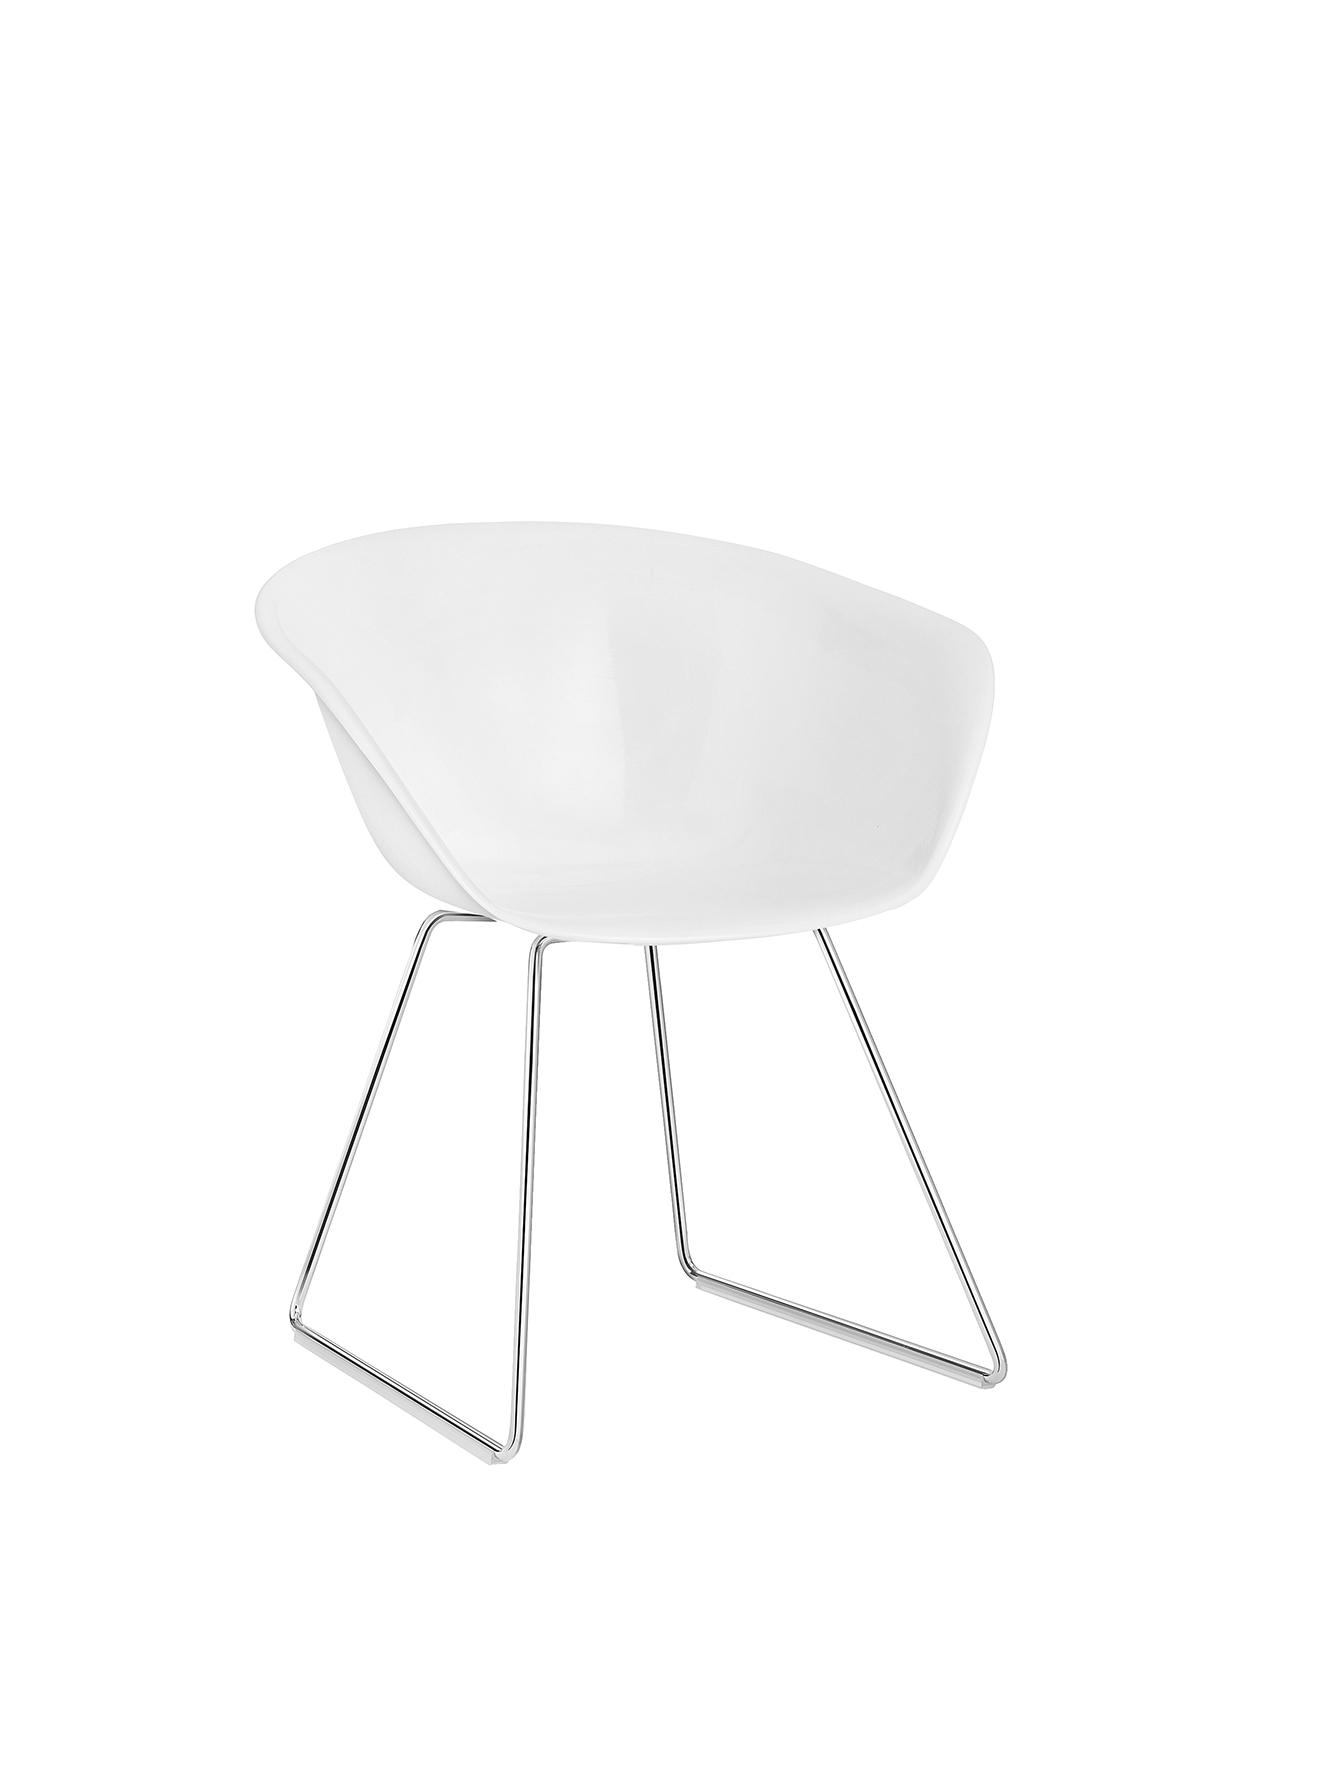 Duna02 4200 chair by Arper